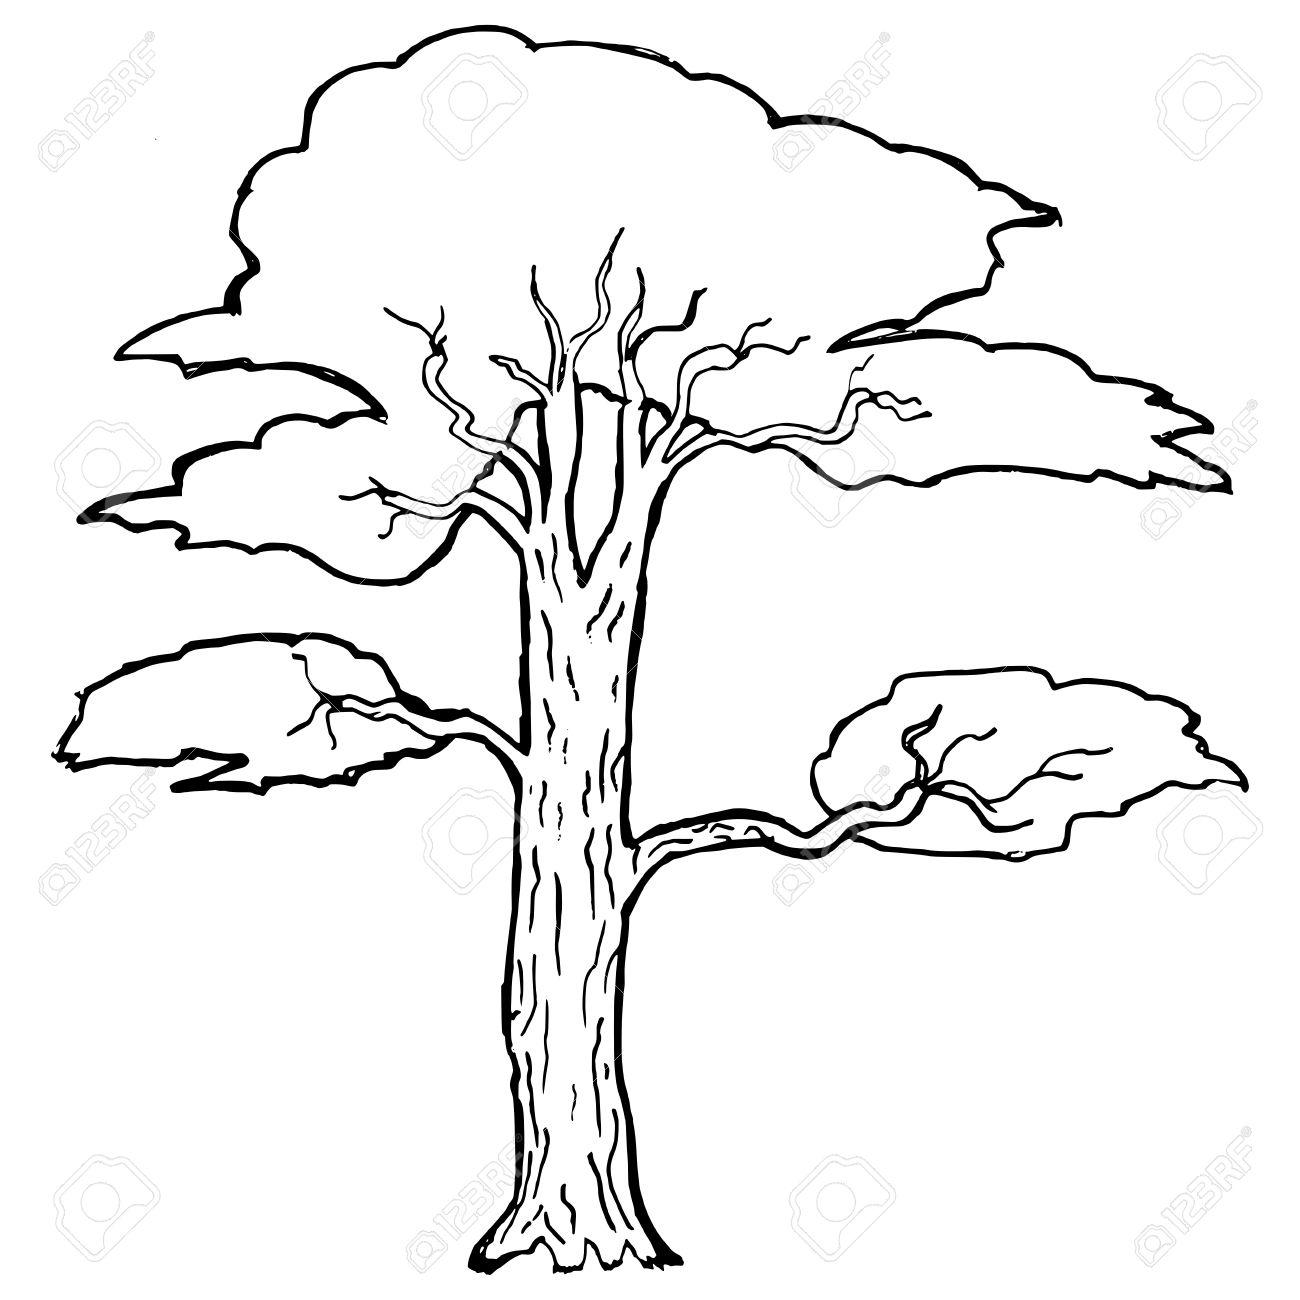 1300x1300 Hand Drawn, Vector, Cartoon Illustration Of Acacia Royalty Free